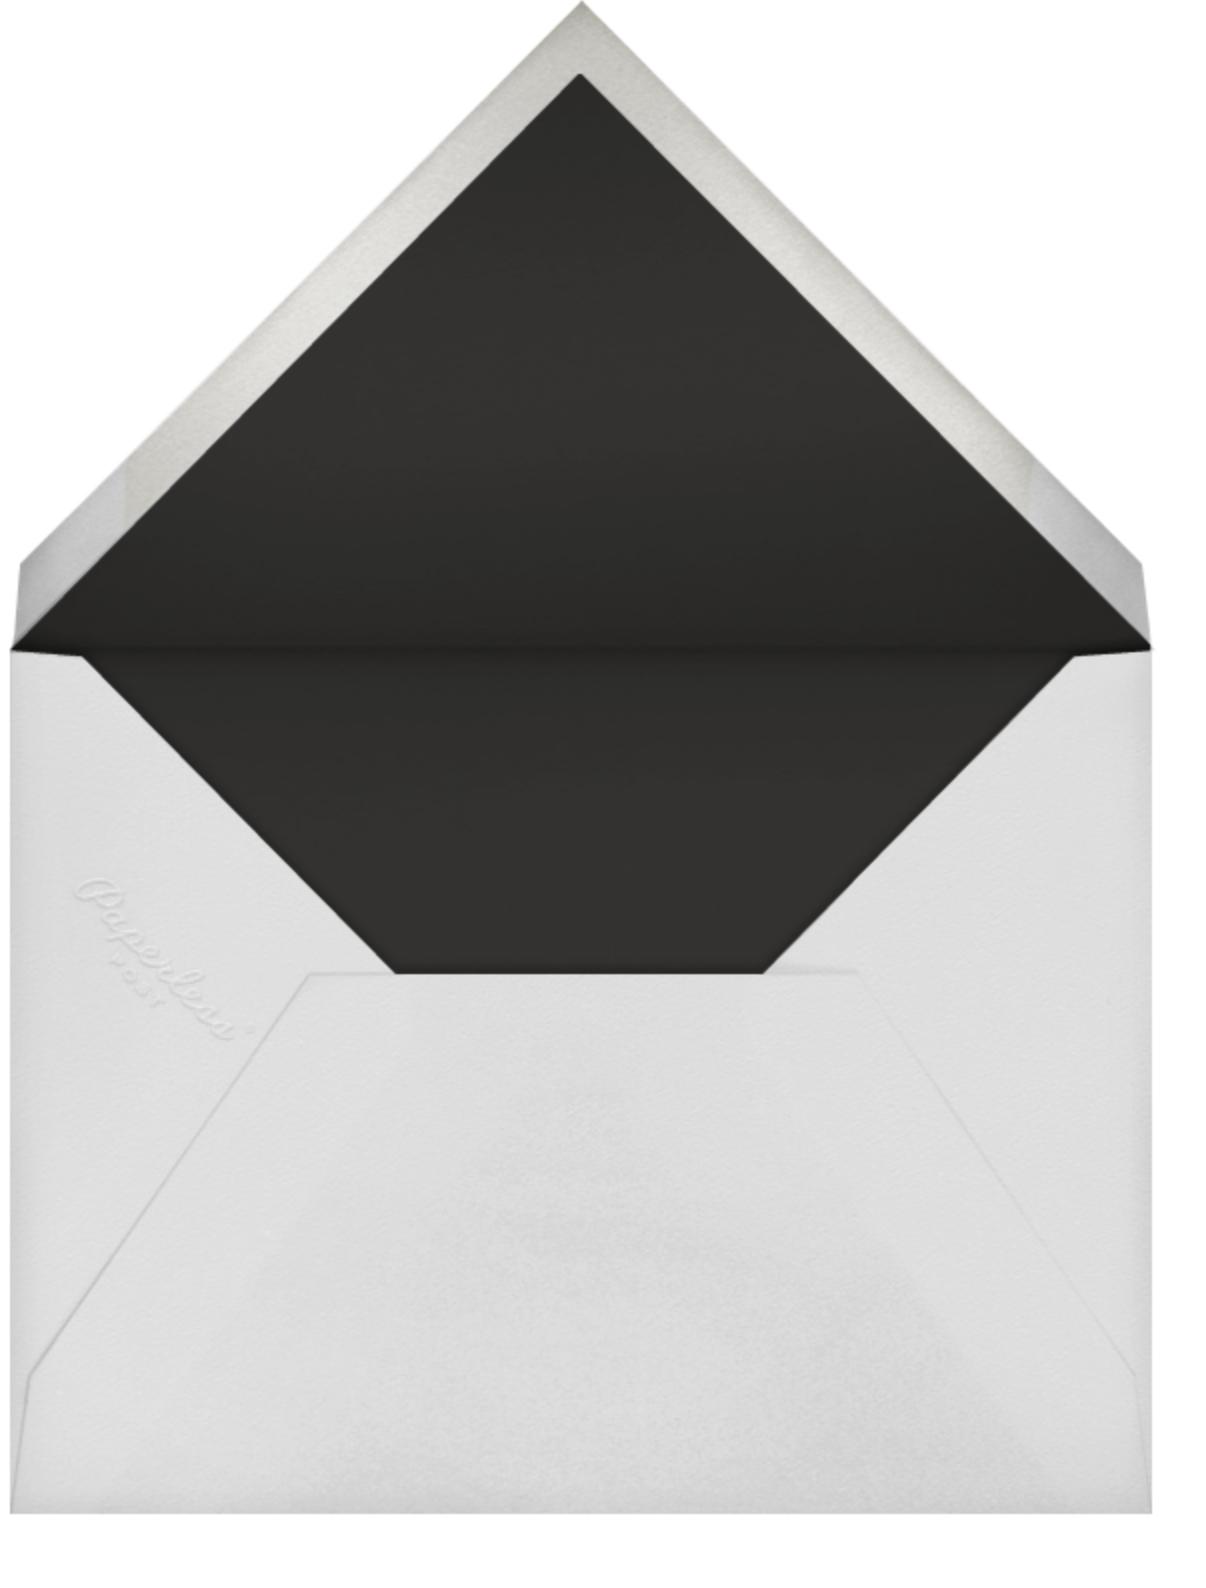 Floral Trellis II (Stationery) - Silver - Oscar de la Renta - Personalized stationery - envelope back